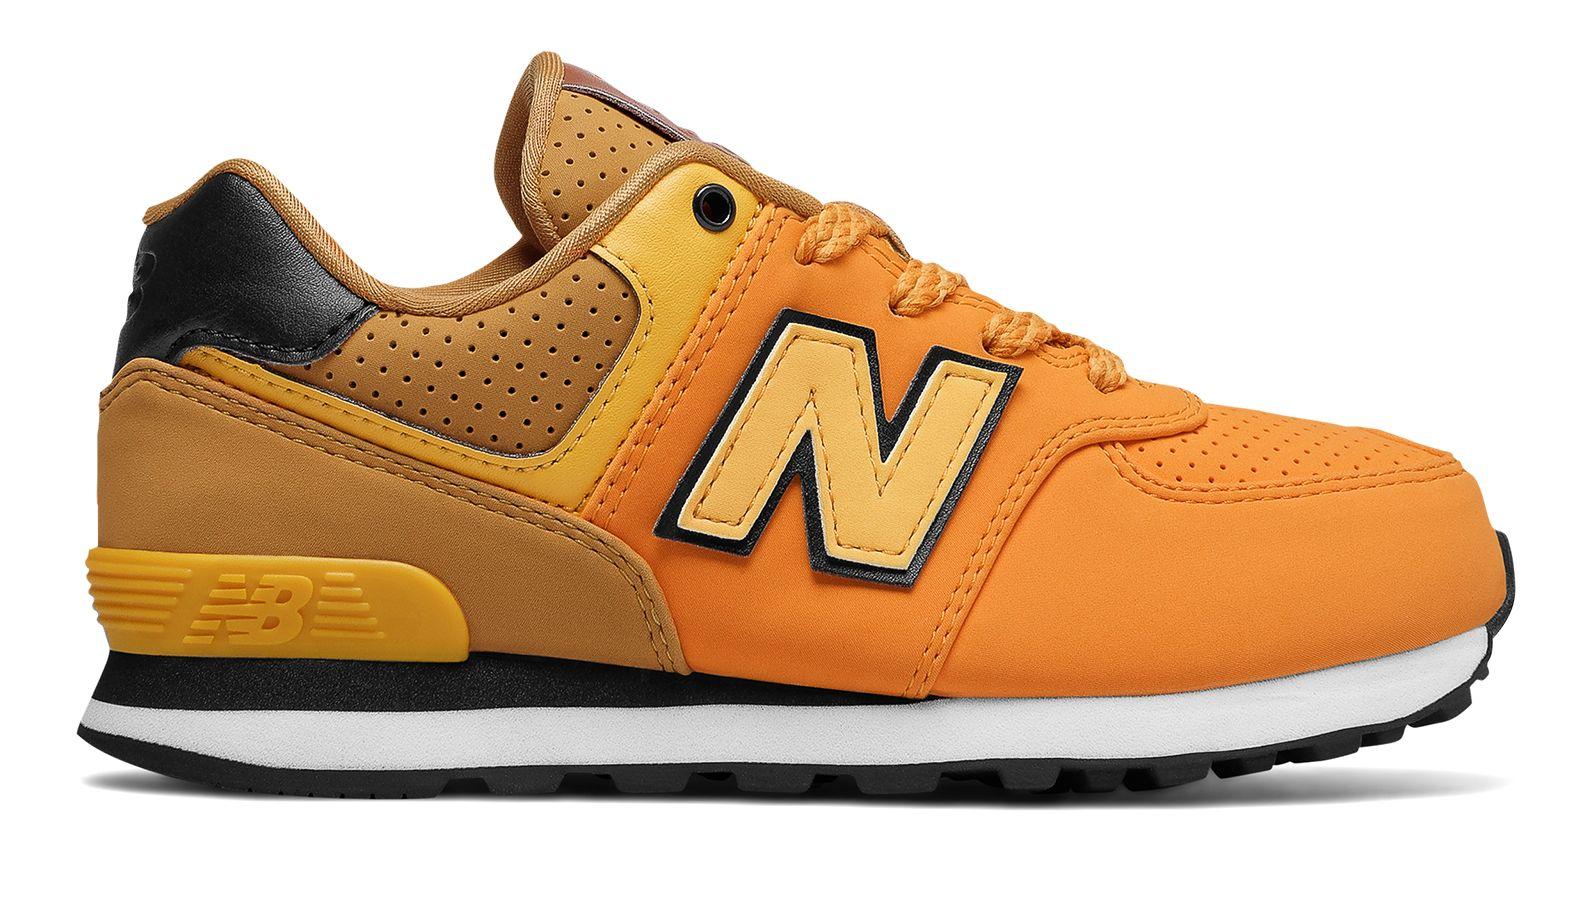 NB 574 New Balance, Yellow with Black